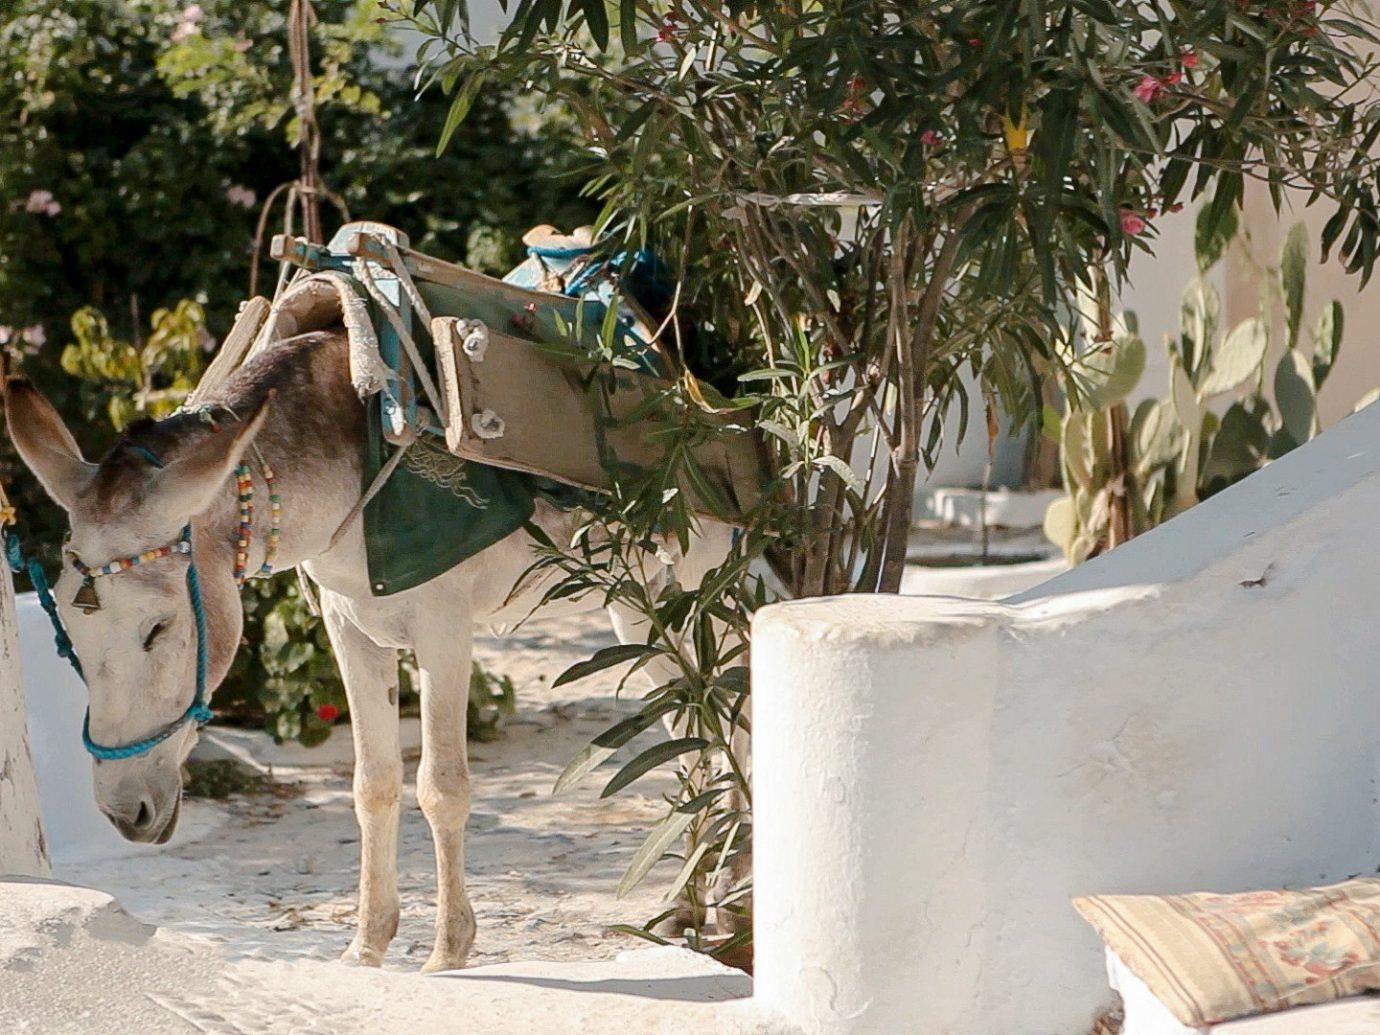 Budget tree art home horse like mammal sculpture